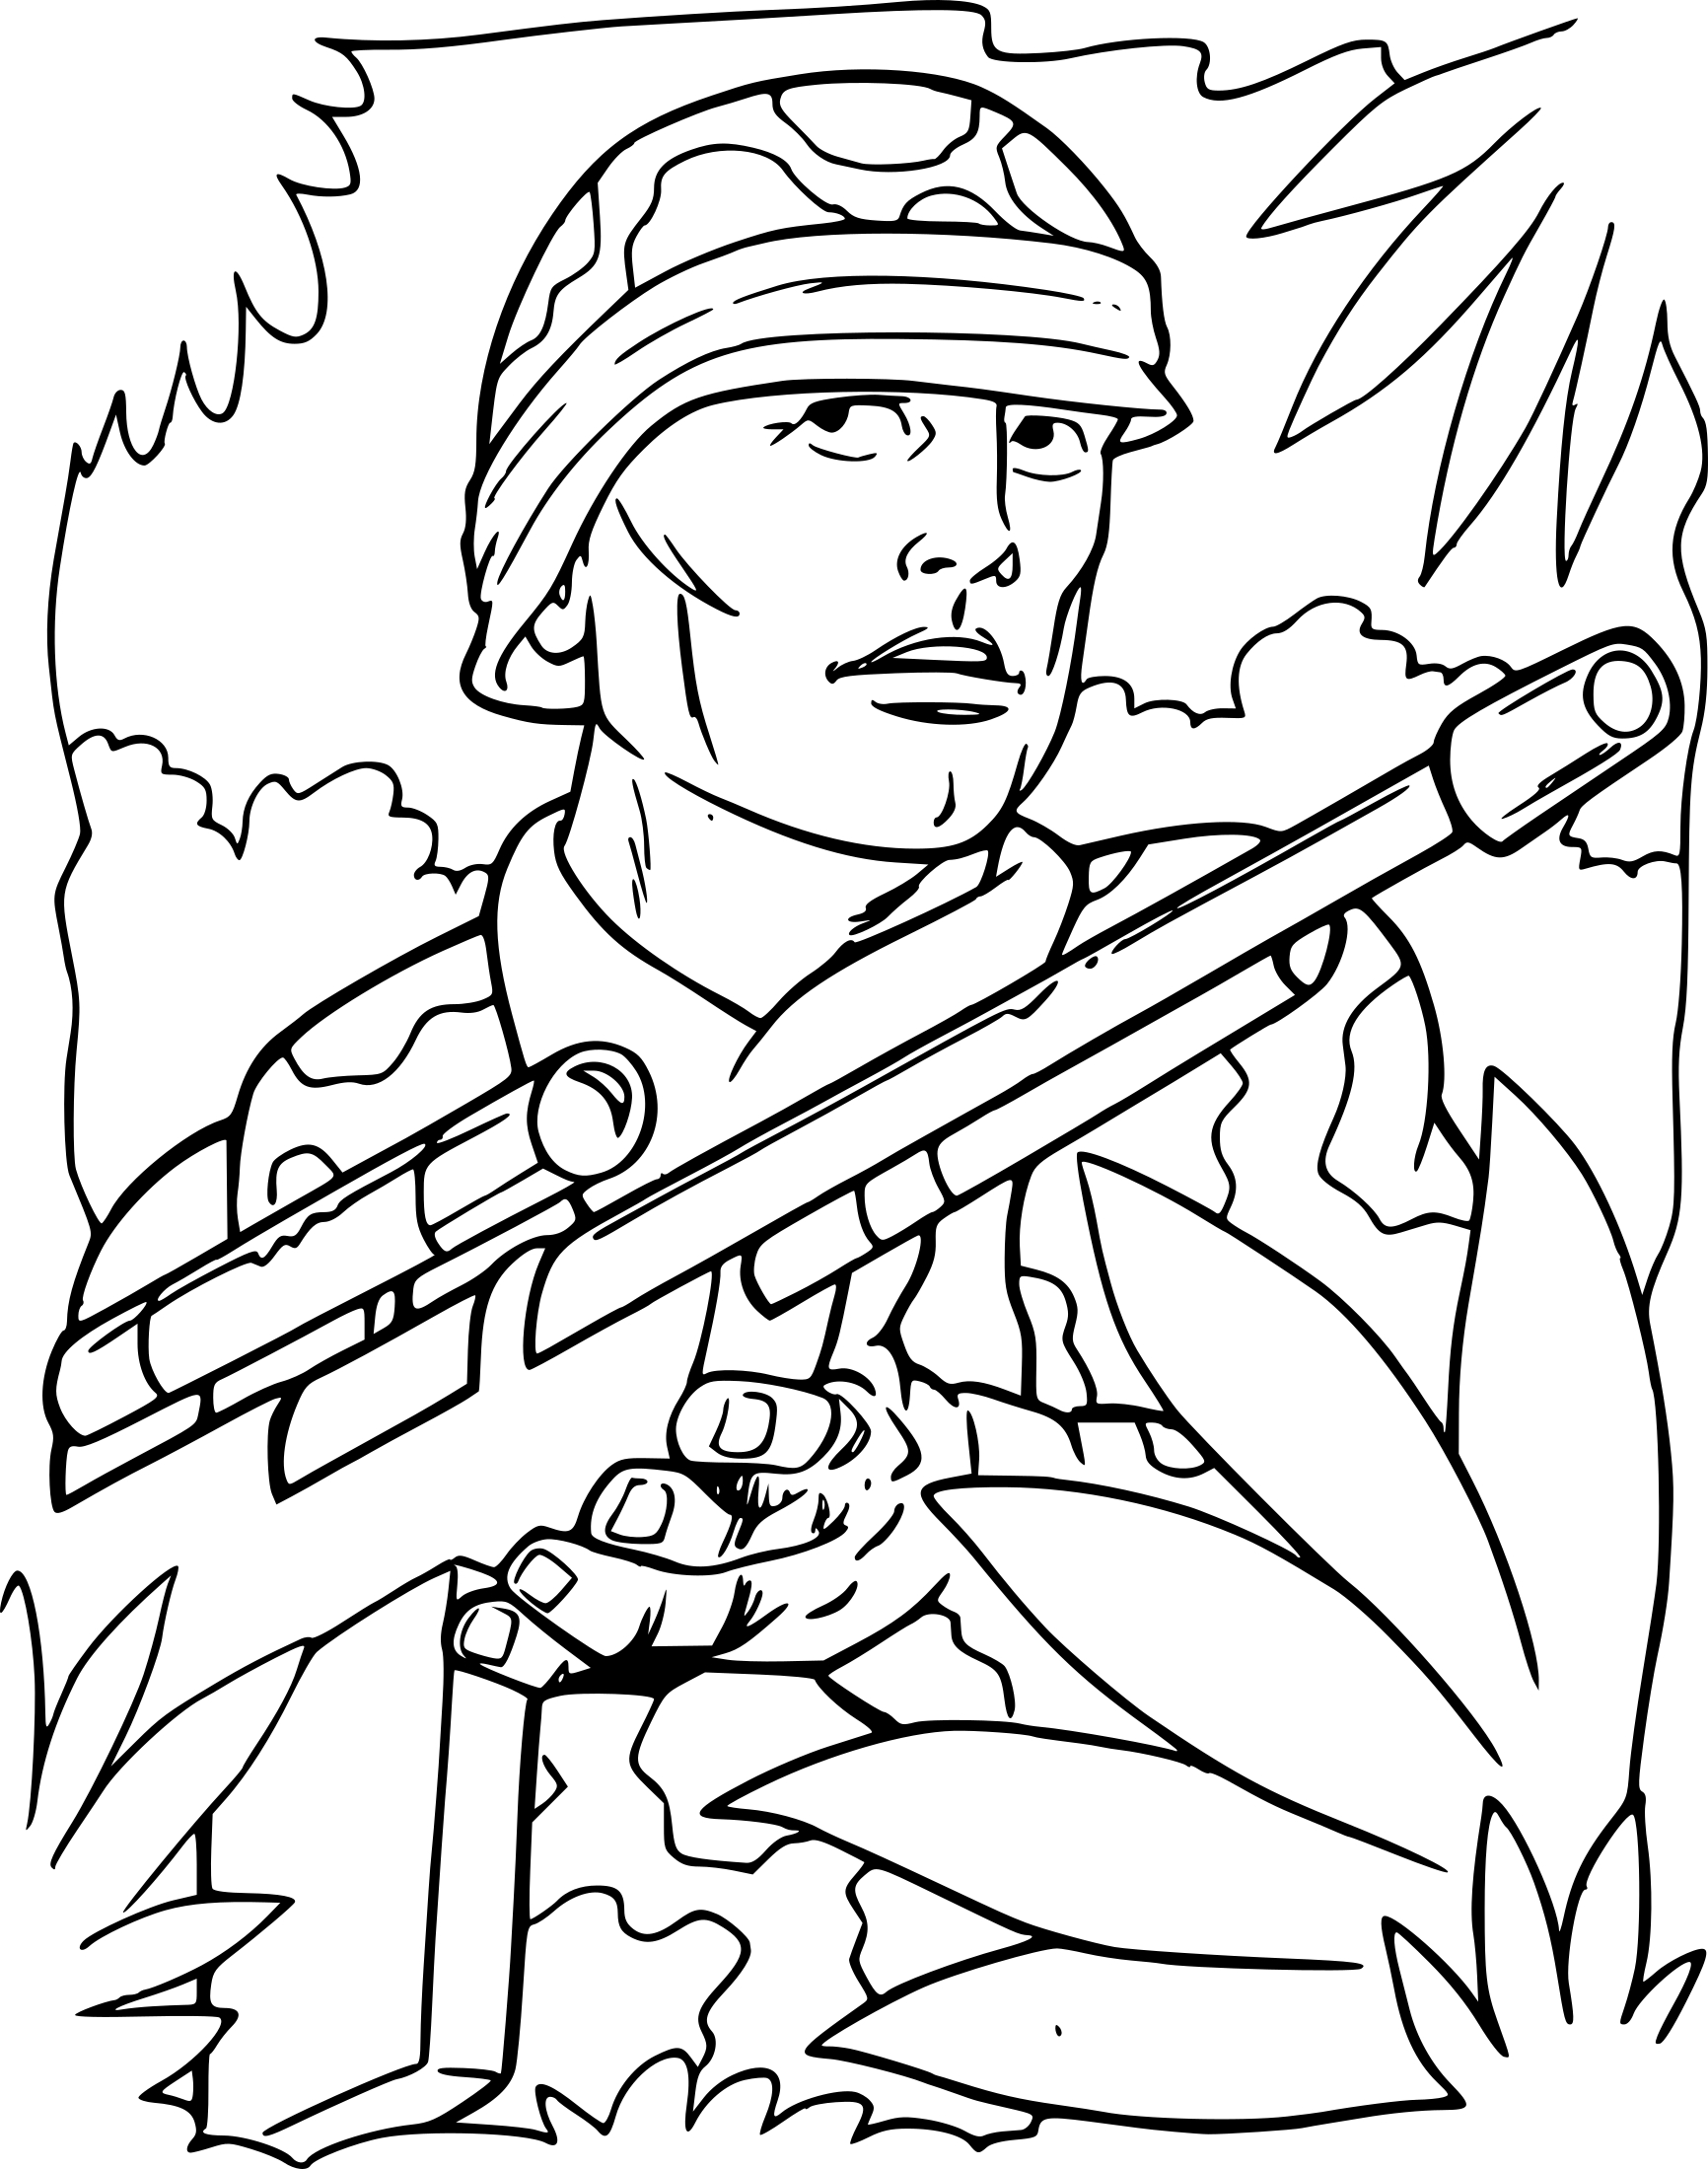 Coloriage soldat de guerre imprimer - Des dessins a imprimer ...